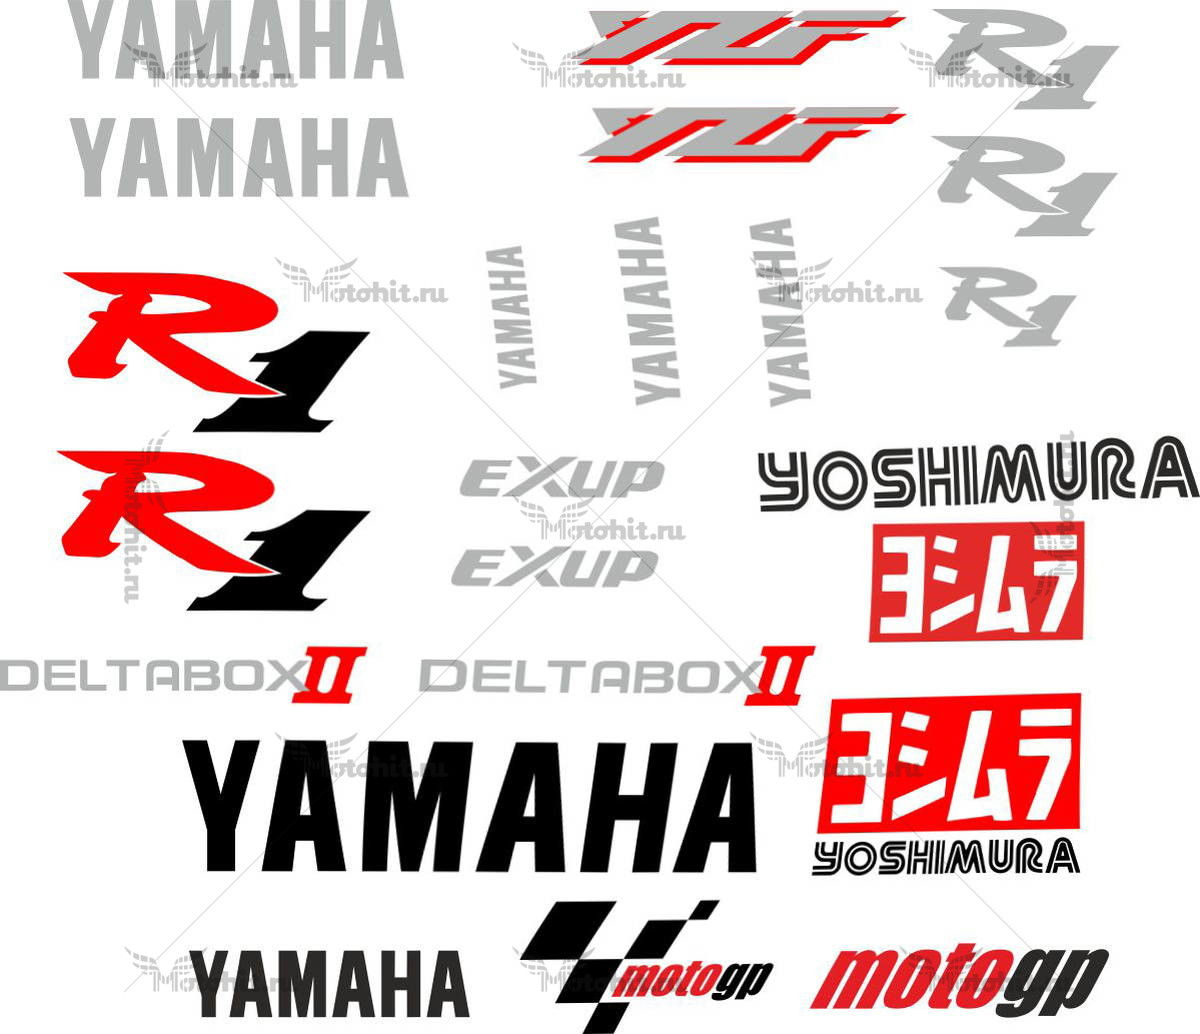 Комплект наклеек Yamaha YZF-R1 2000 YOUSHIMURA